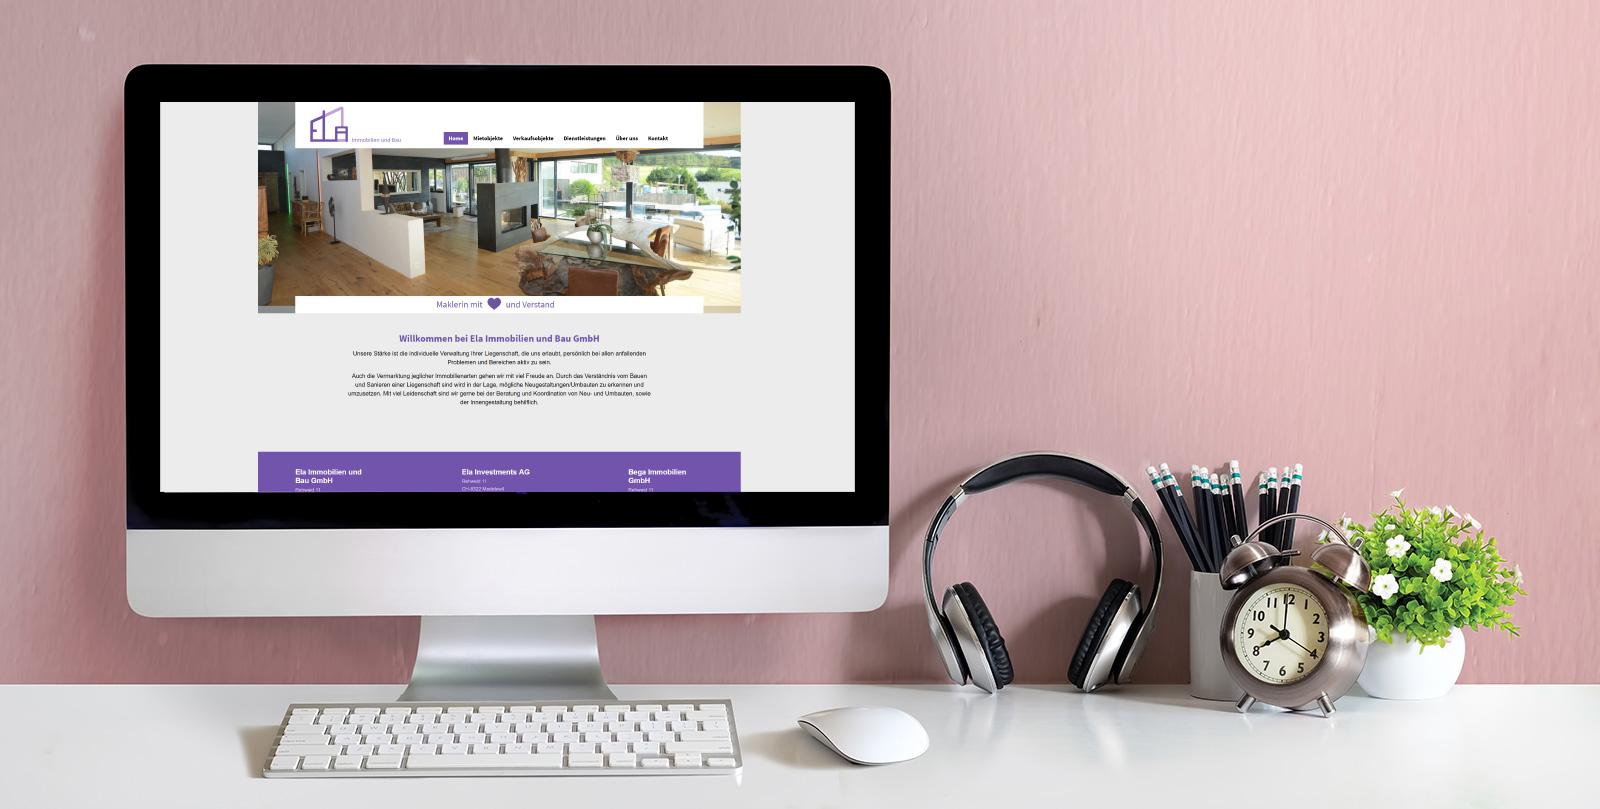 content-referenzen-details-ela-immobilien-mac-desktop